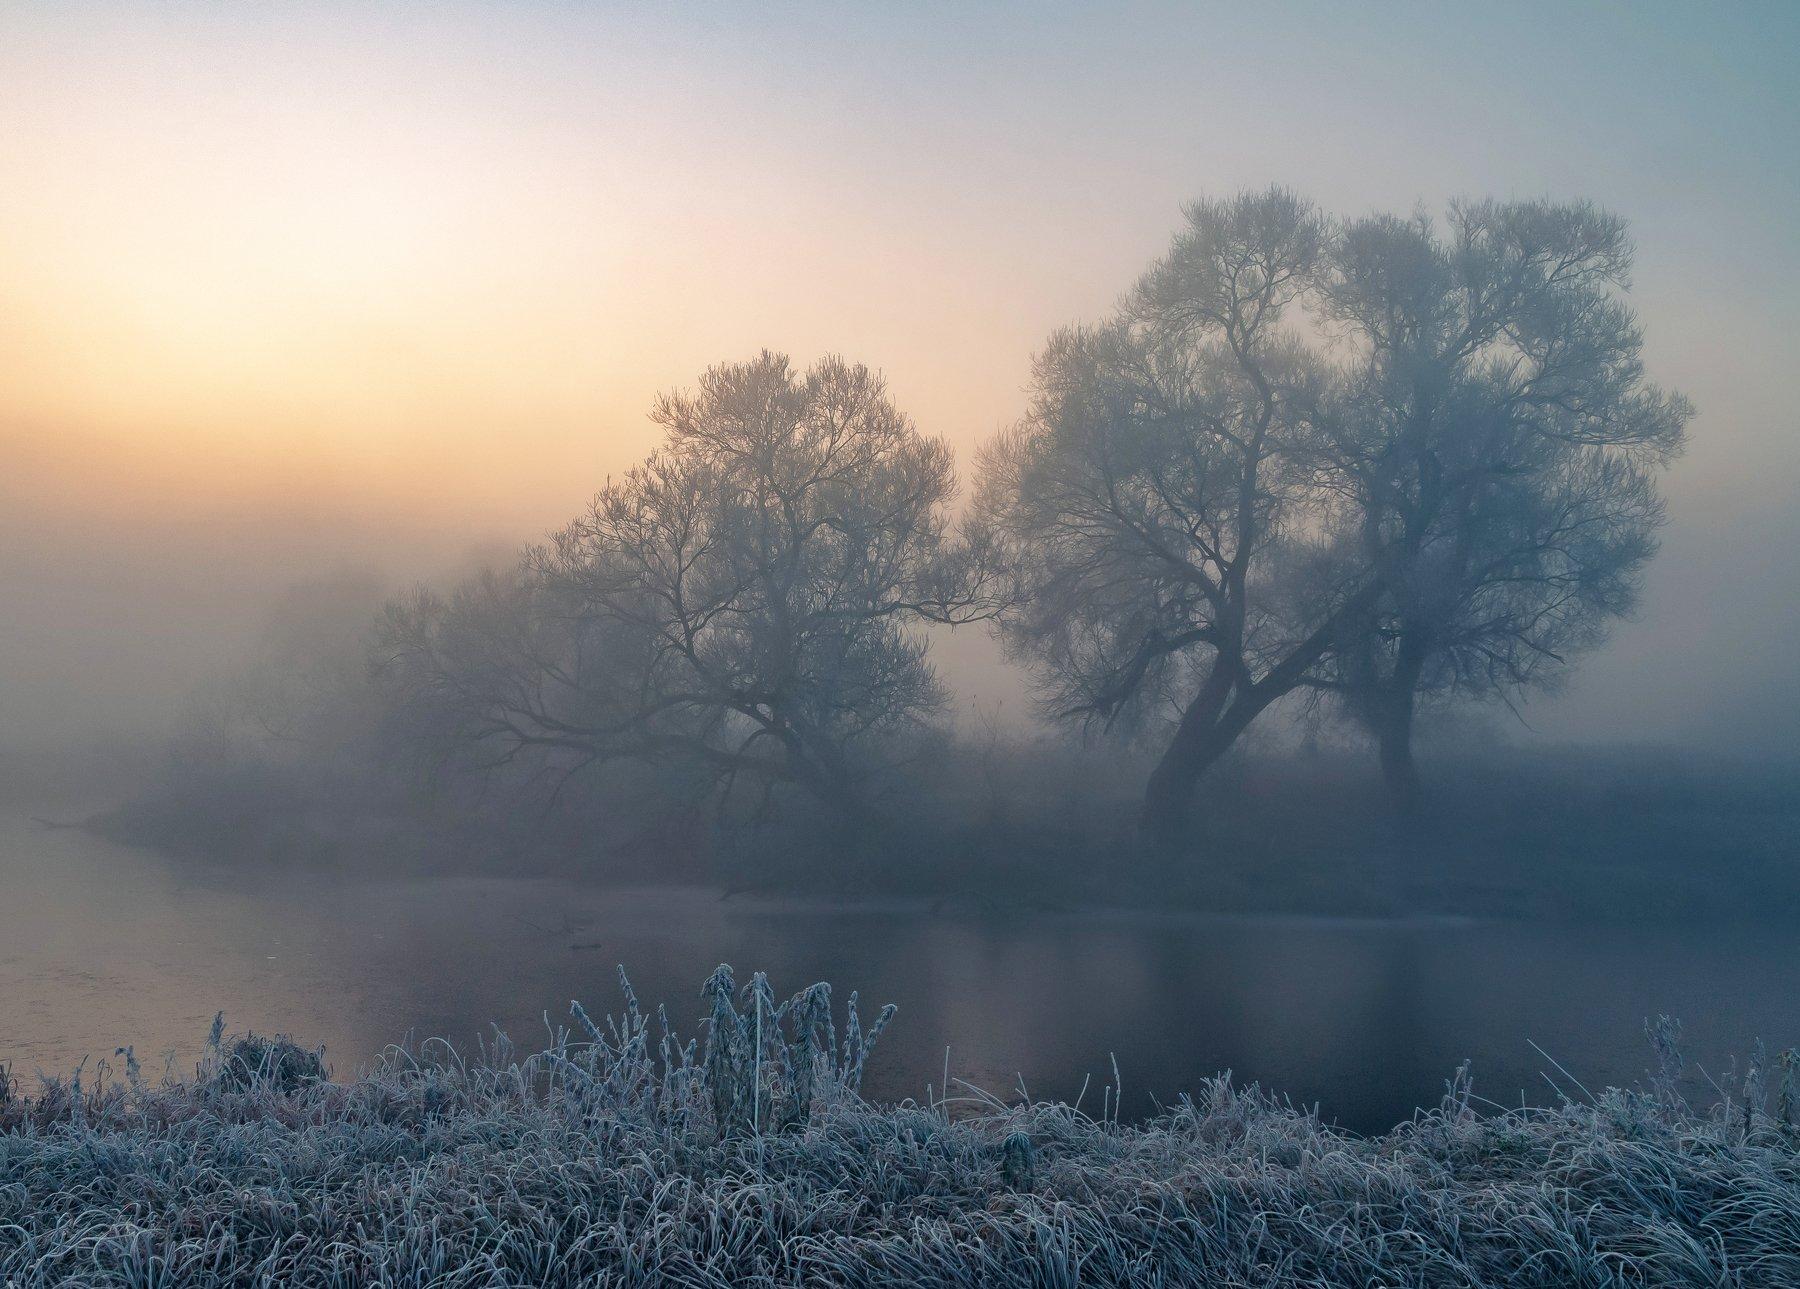 утро, свислочь, туман, иней, пейзаж, Александр Гвоздь